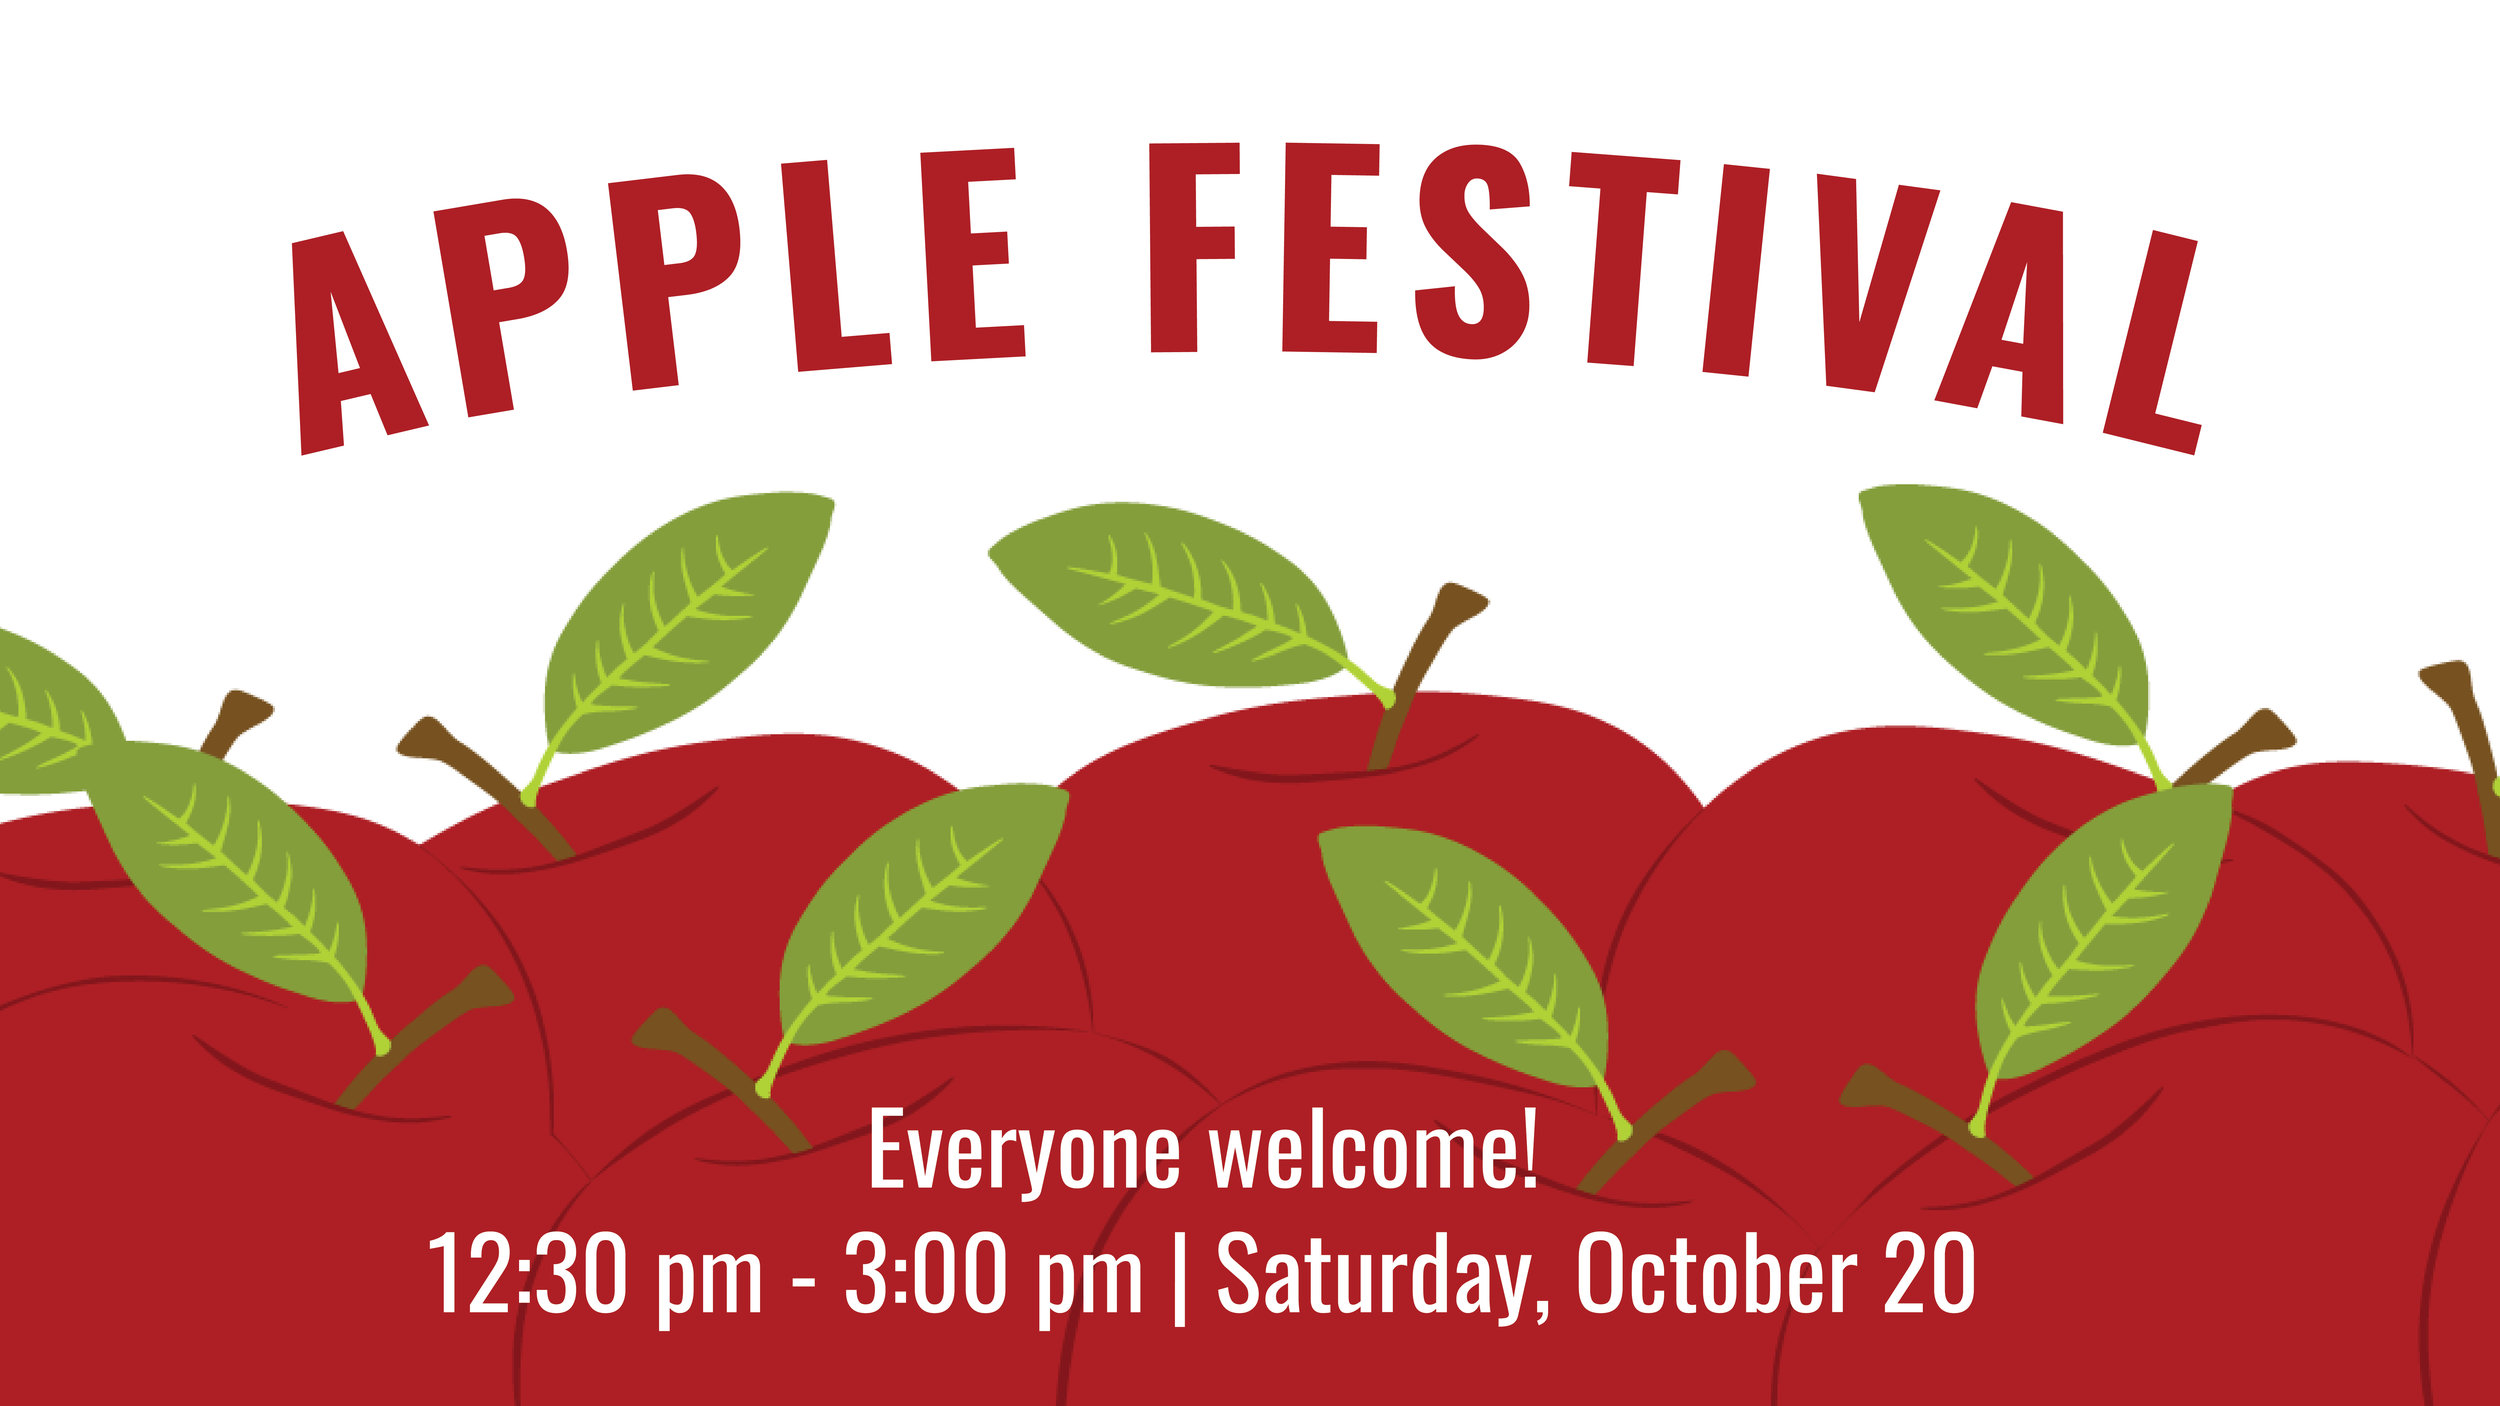 180823 Apple Fest FB Event Image_revised.jpg